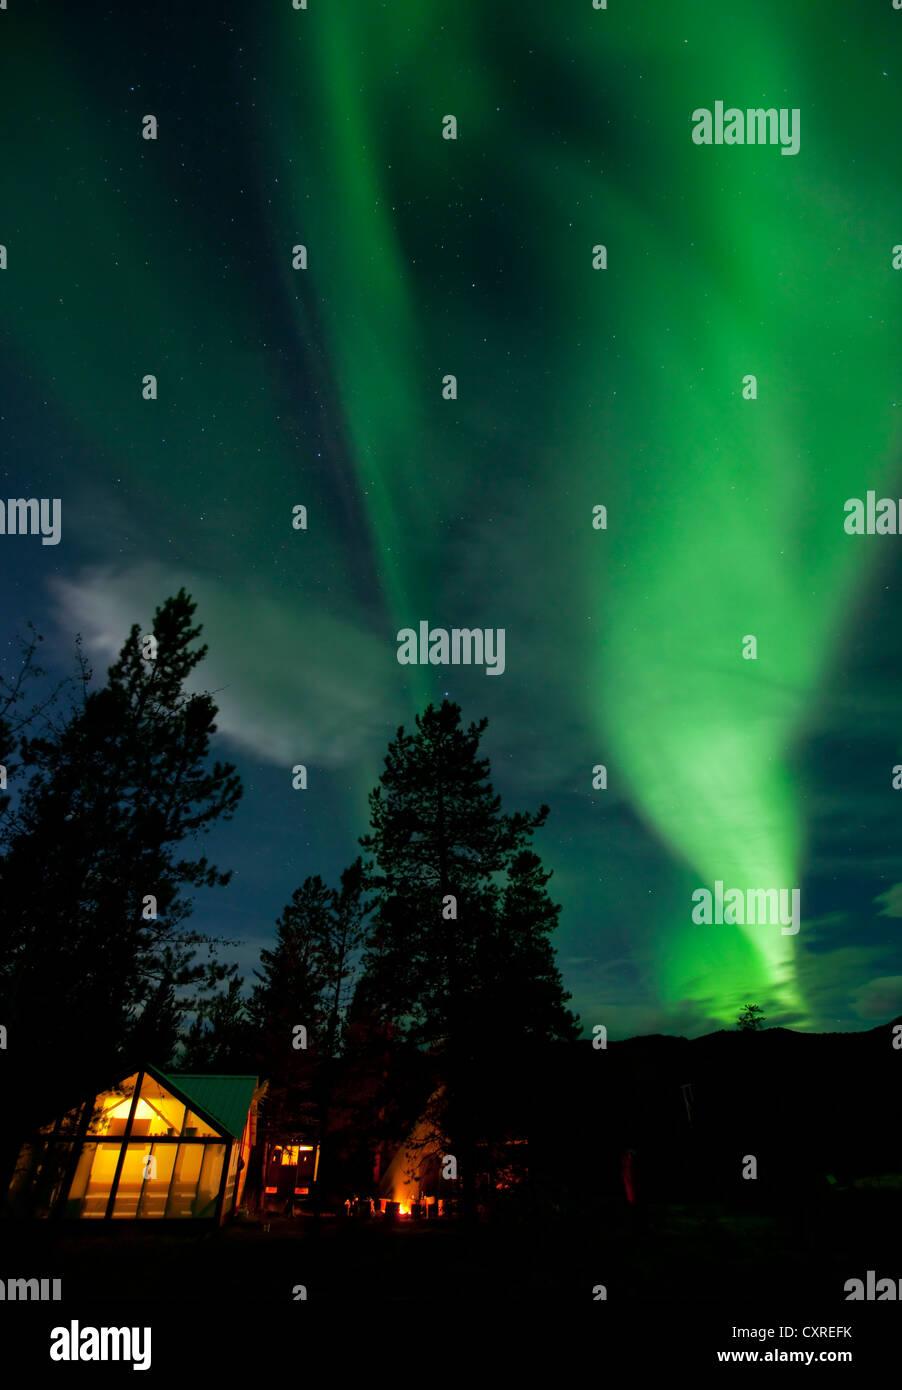 Illuminated wall tent, cabin, green northern polar lights, Aurora borealis, spruce trees, near Whitehorse, Yukon Stock Photo